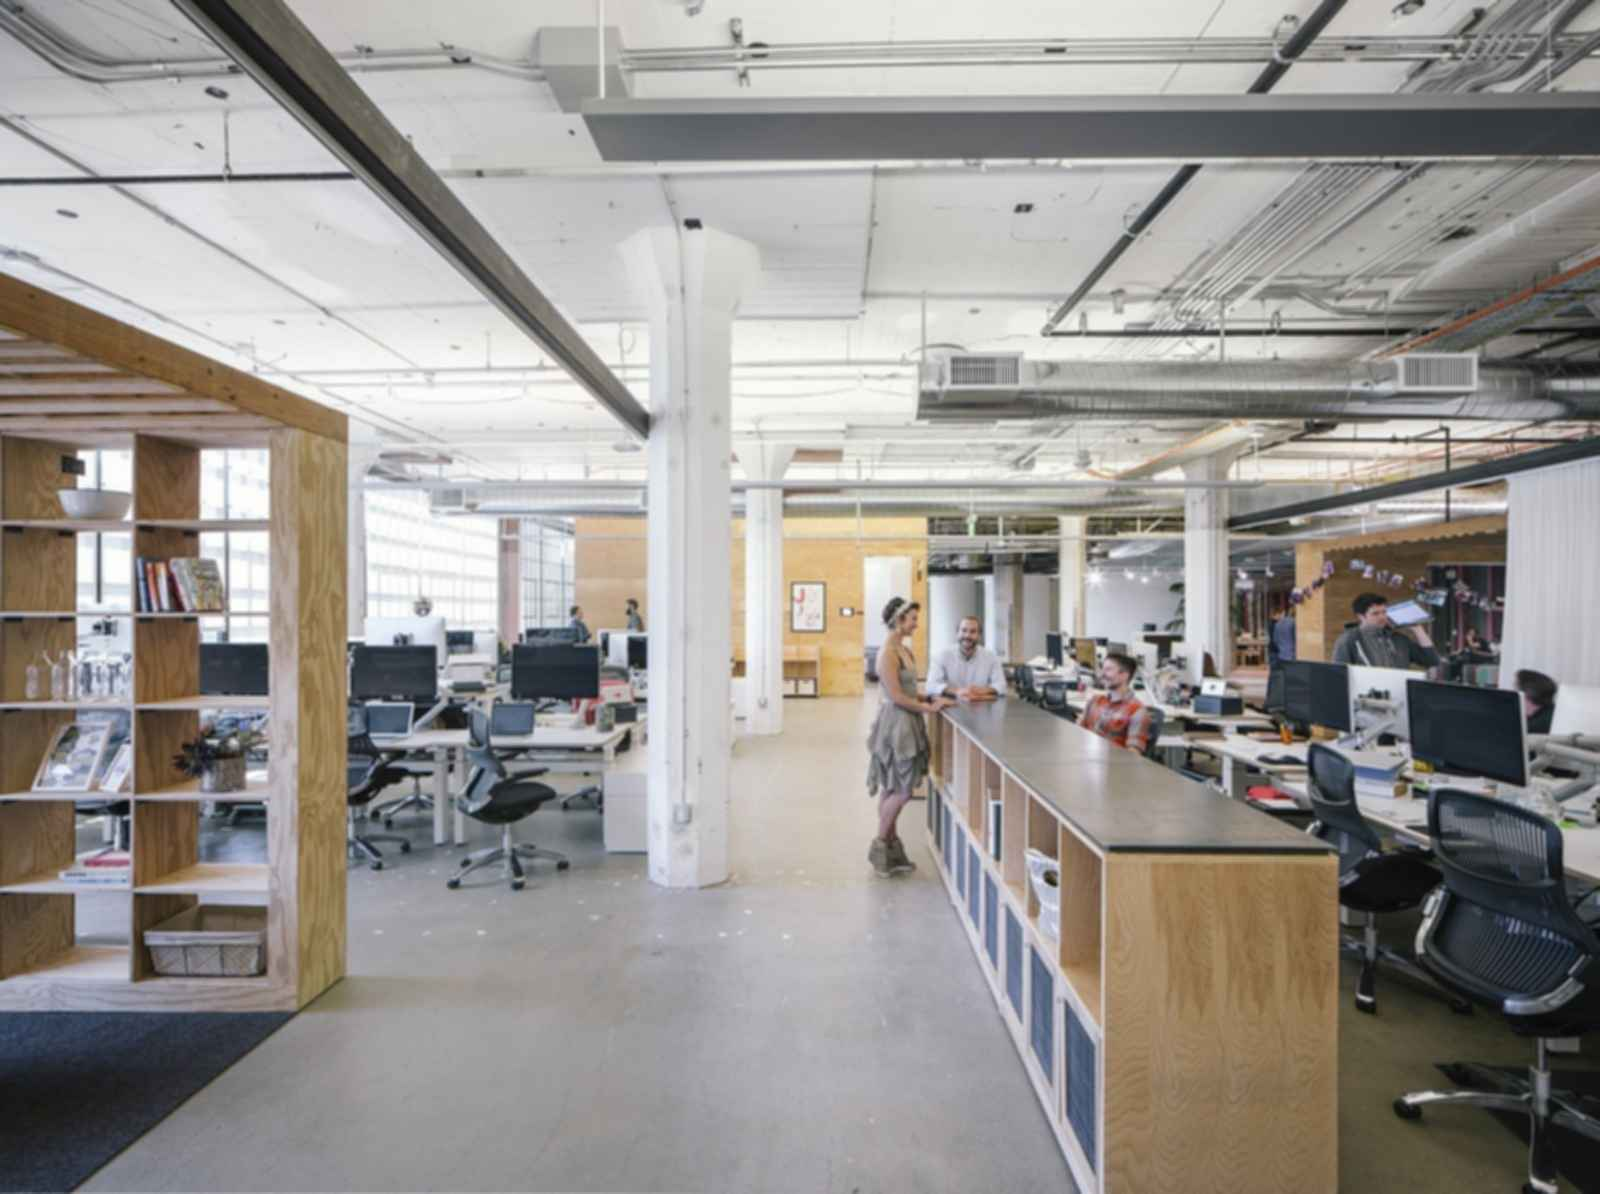 Airbnb Headquarters - Interior/Office Spaces